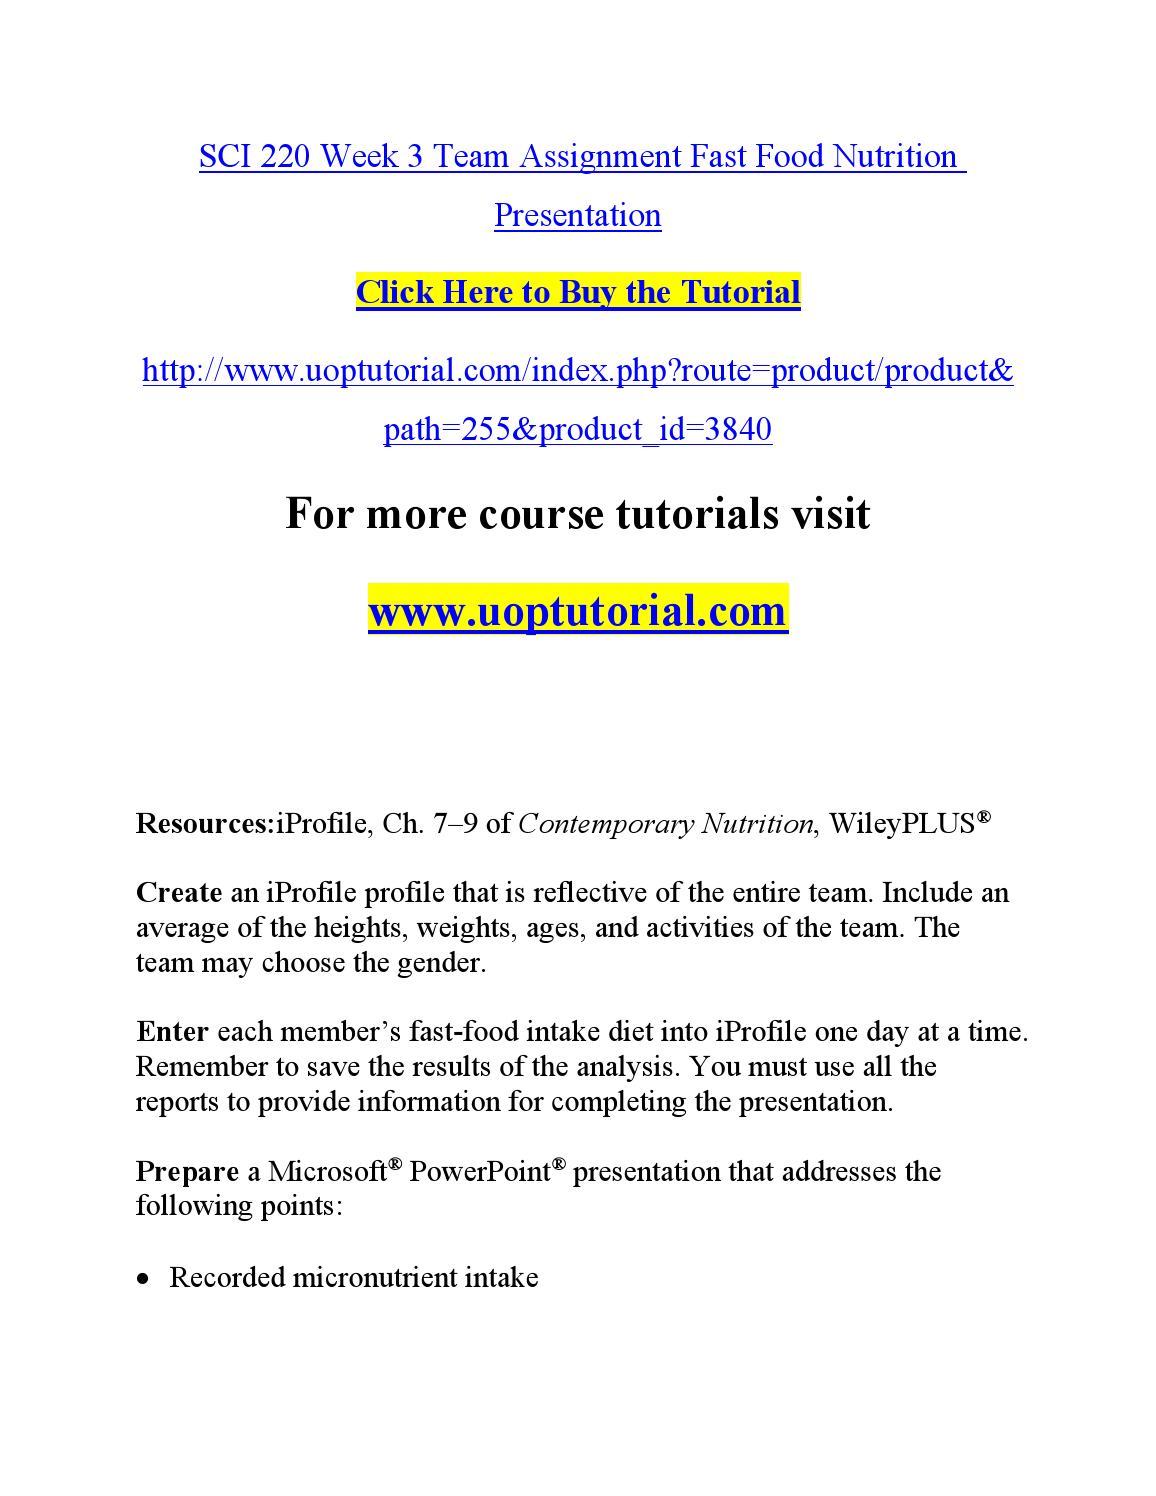 nutrition diet analysis assignment